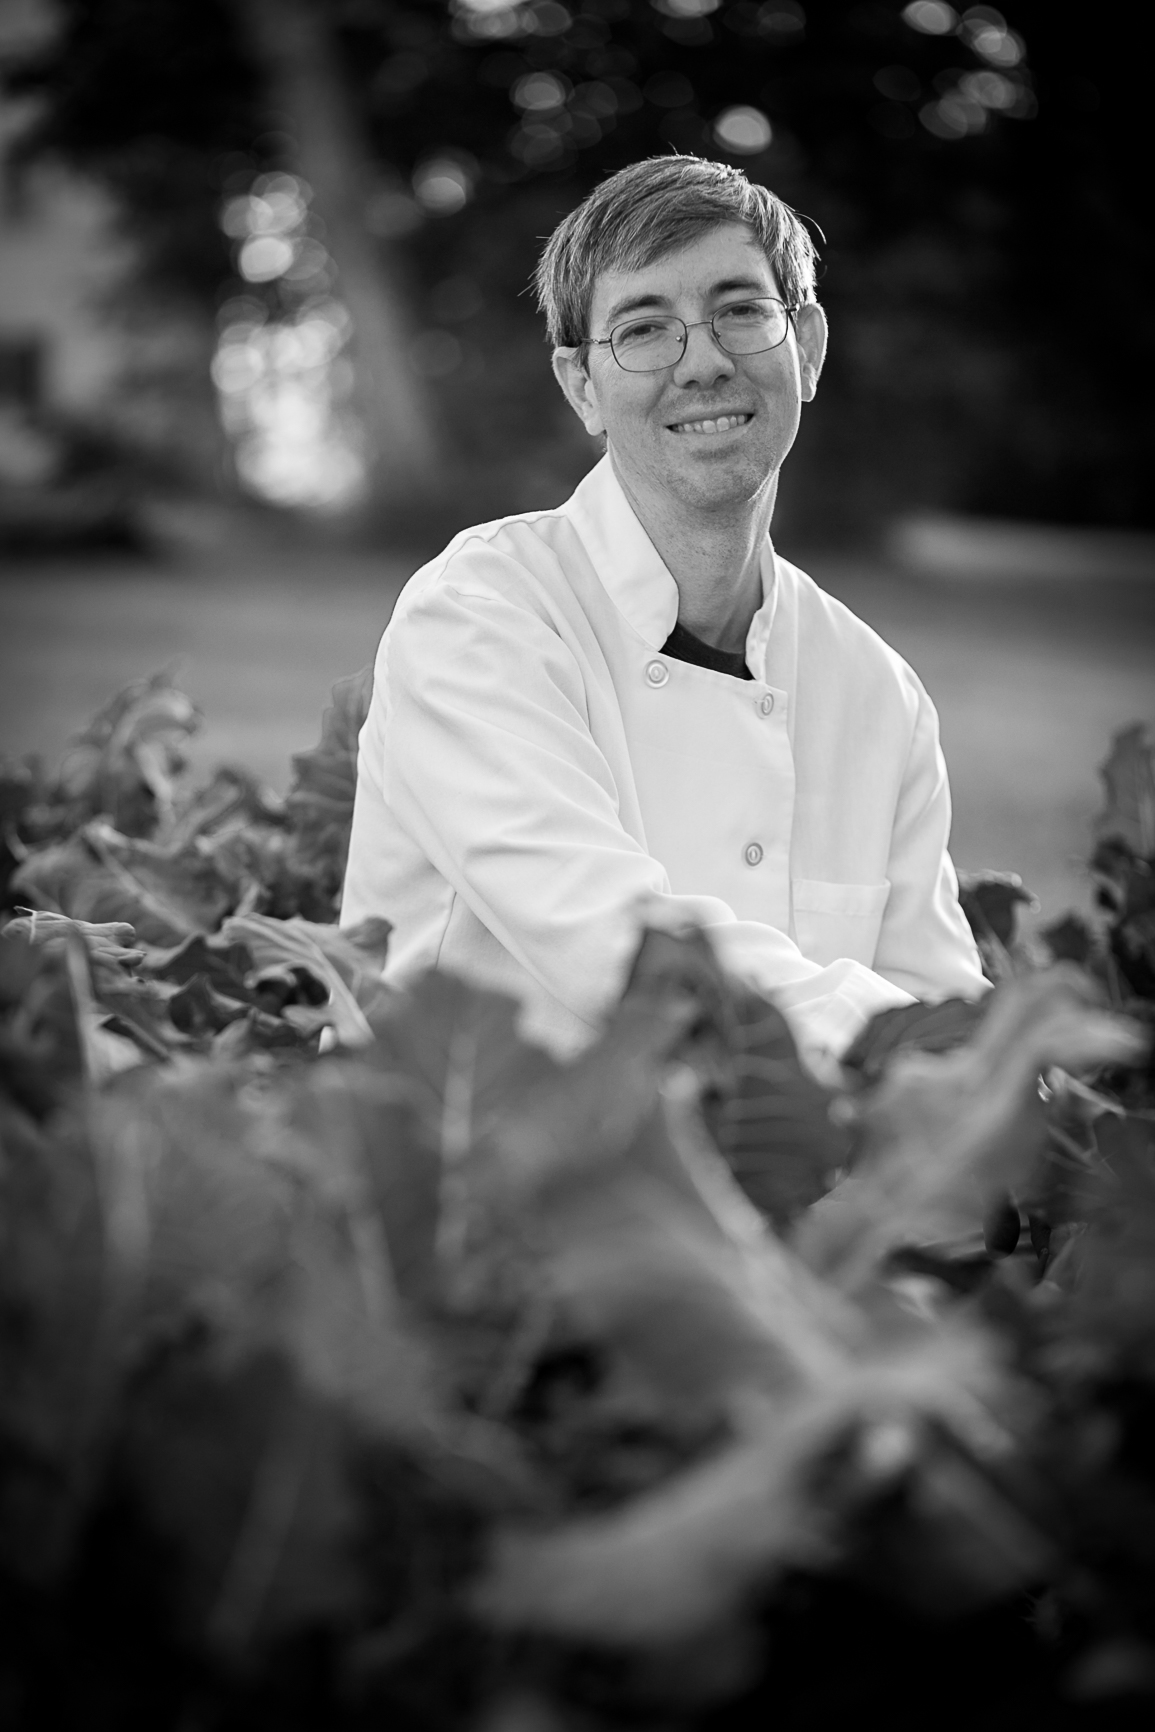 chef in the broccoli row